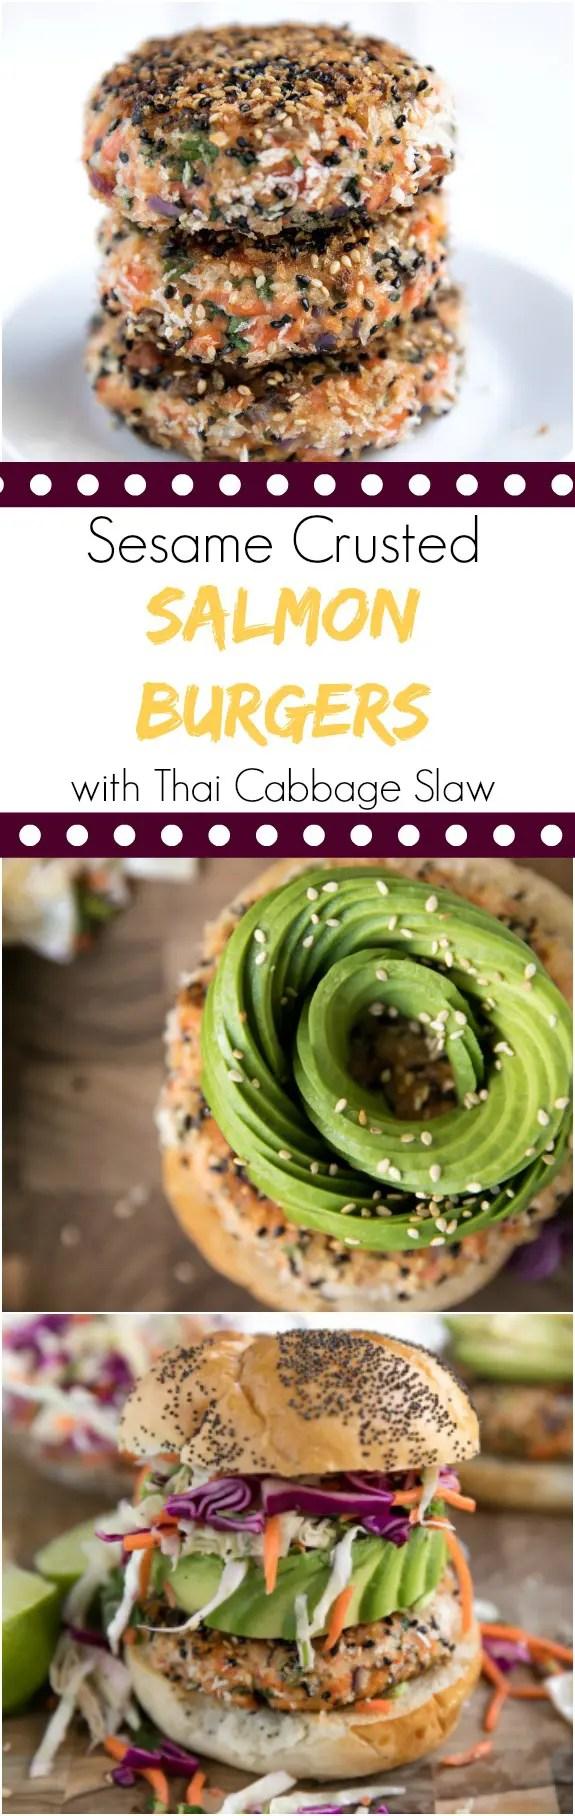 Sesame Crusted Salmon Burgers with Thai Cabbage Slaw. #burger #salmon #thai #healthyrecipes